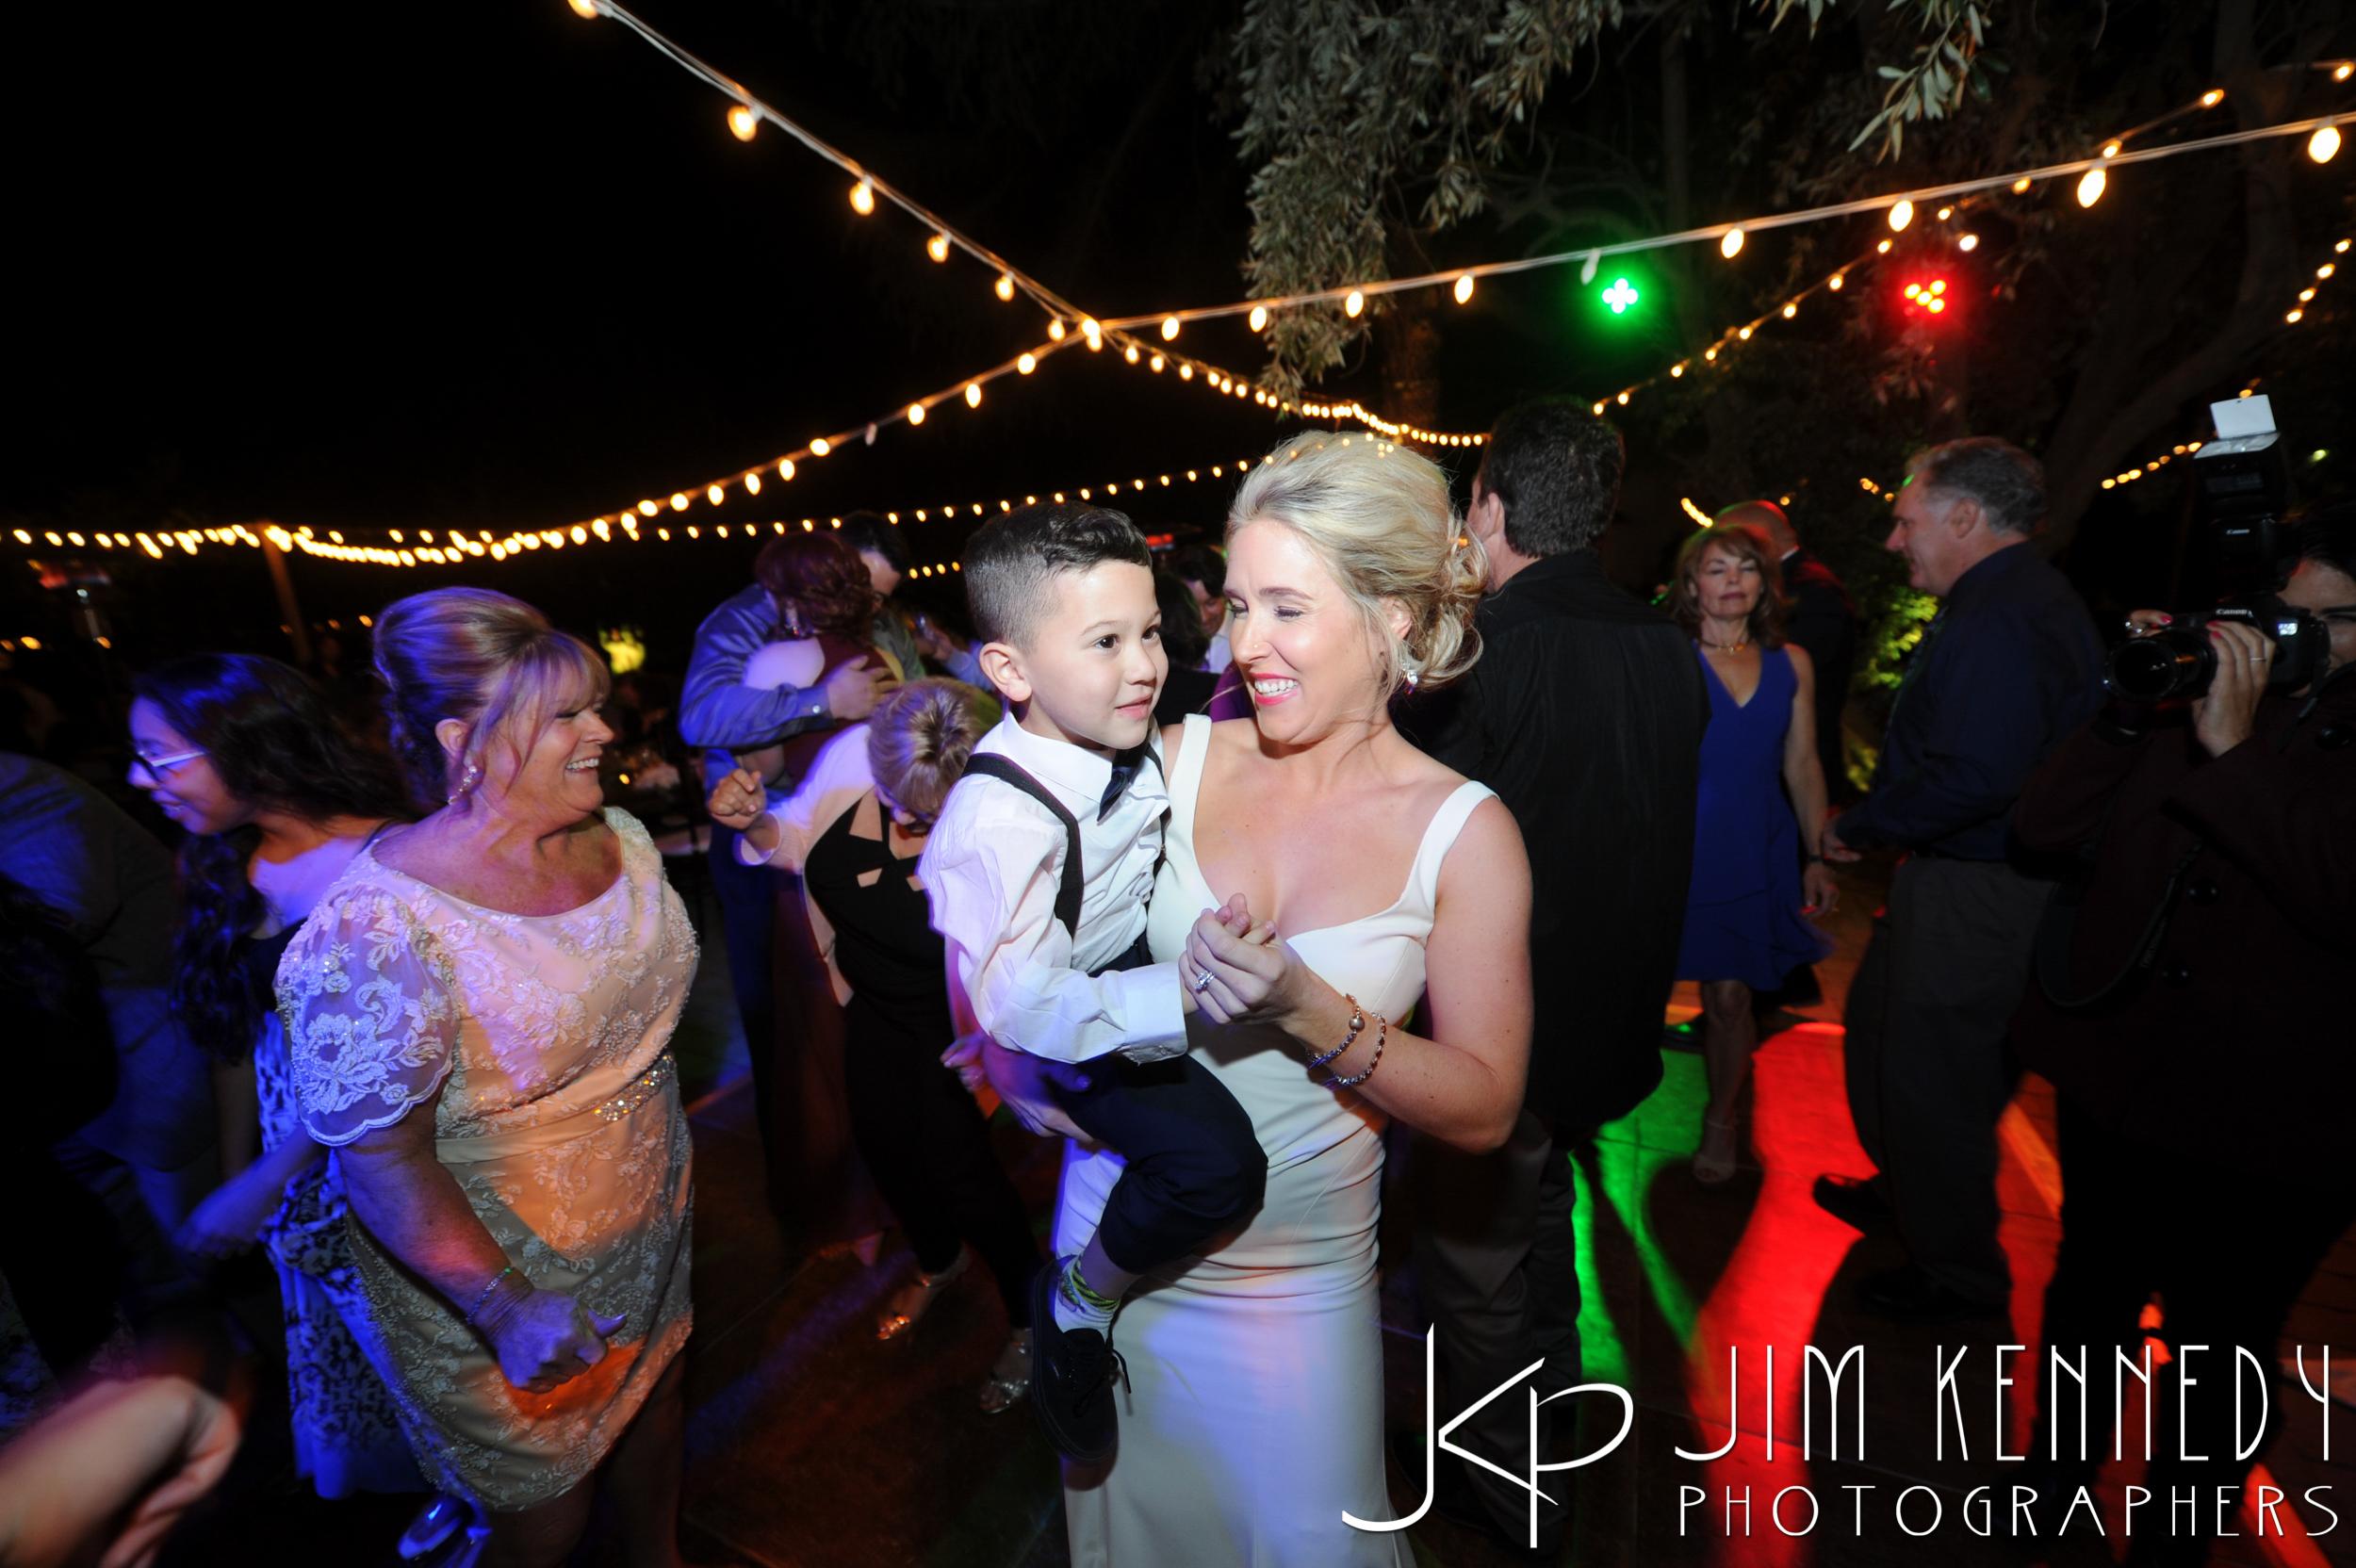 jim_kennedy_photographers_highland_springs_wedding_caitlyn_0207.jpg